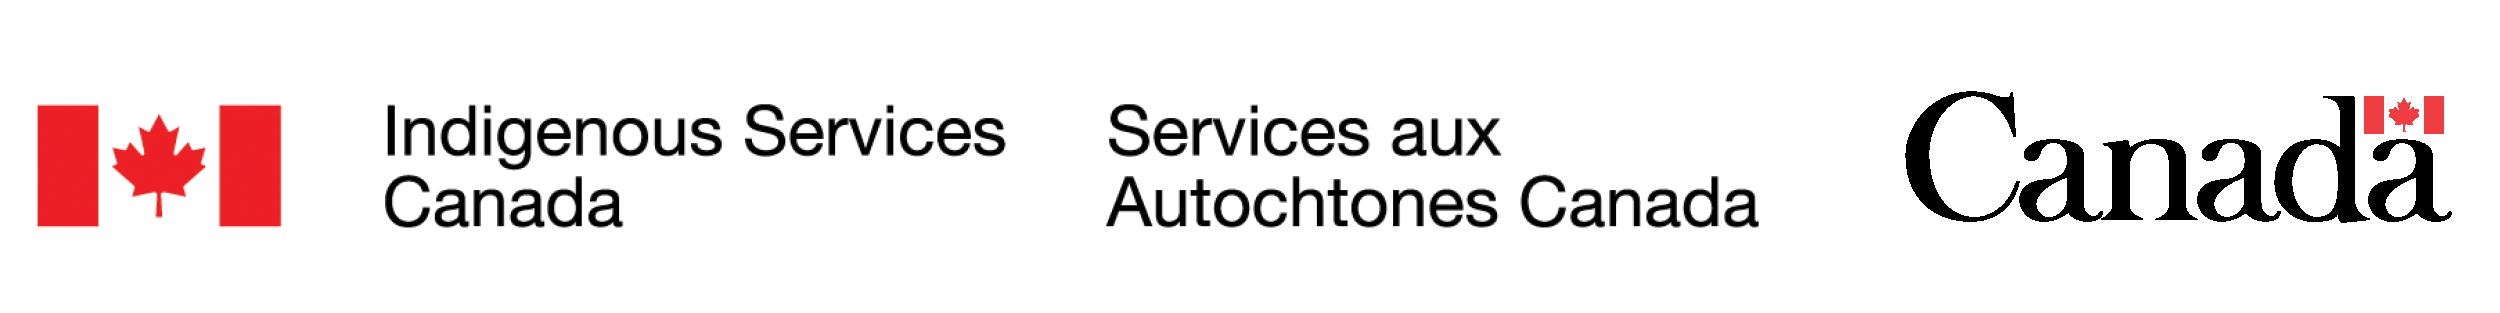 Indigenous Services Canada / Services aux Autochtones Canada